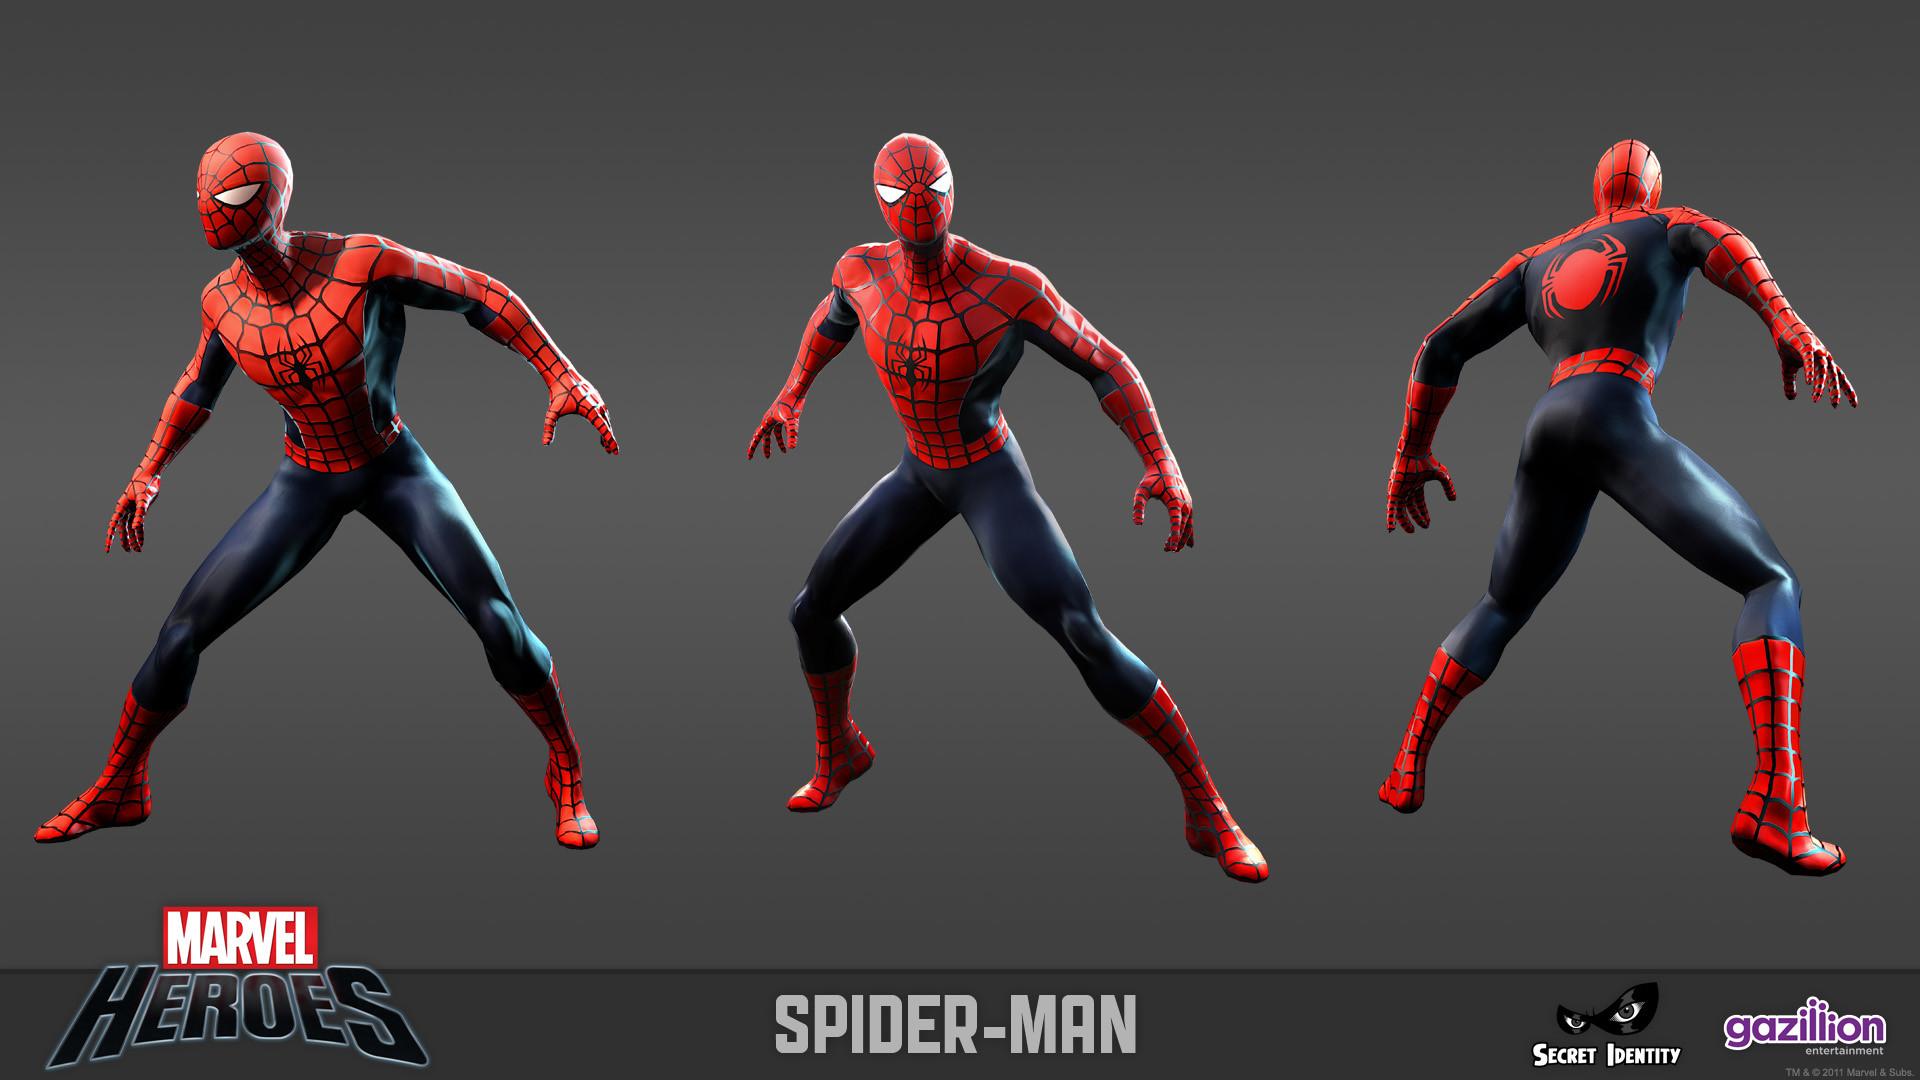 Spiderman Logo Wallpaper 67 Images